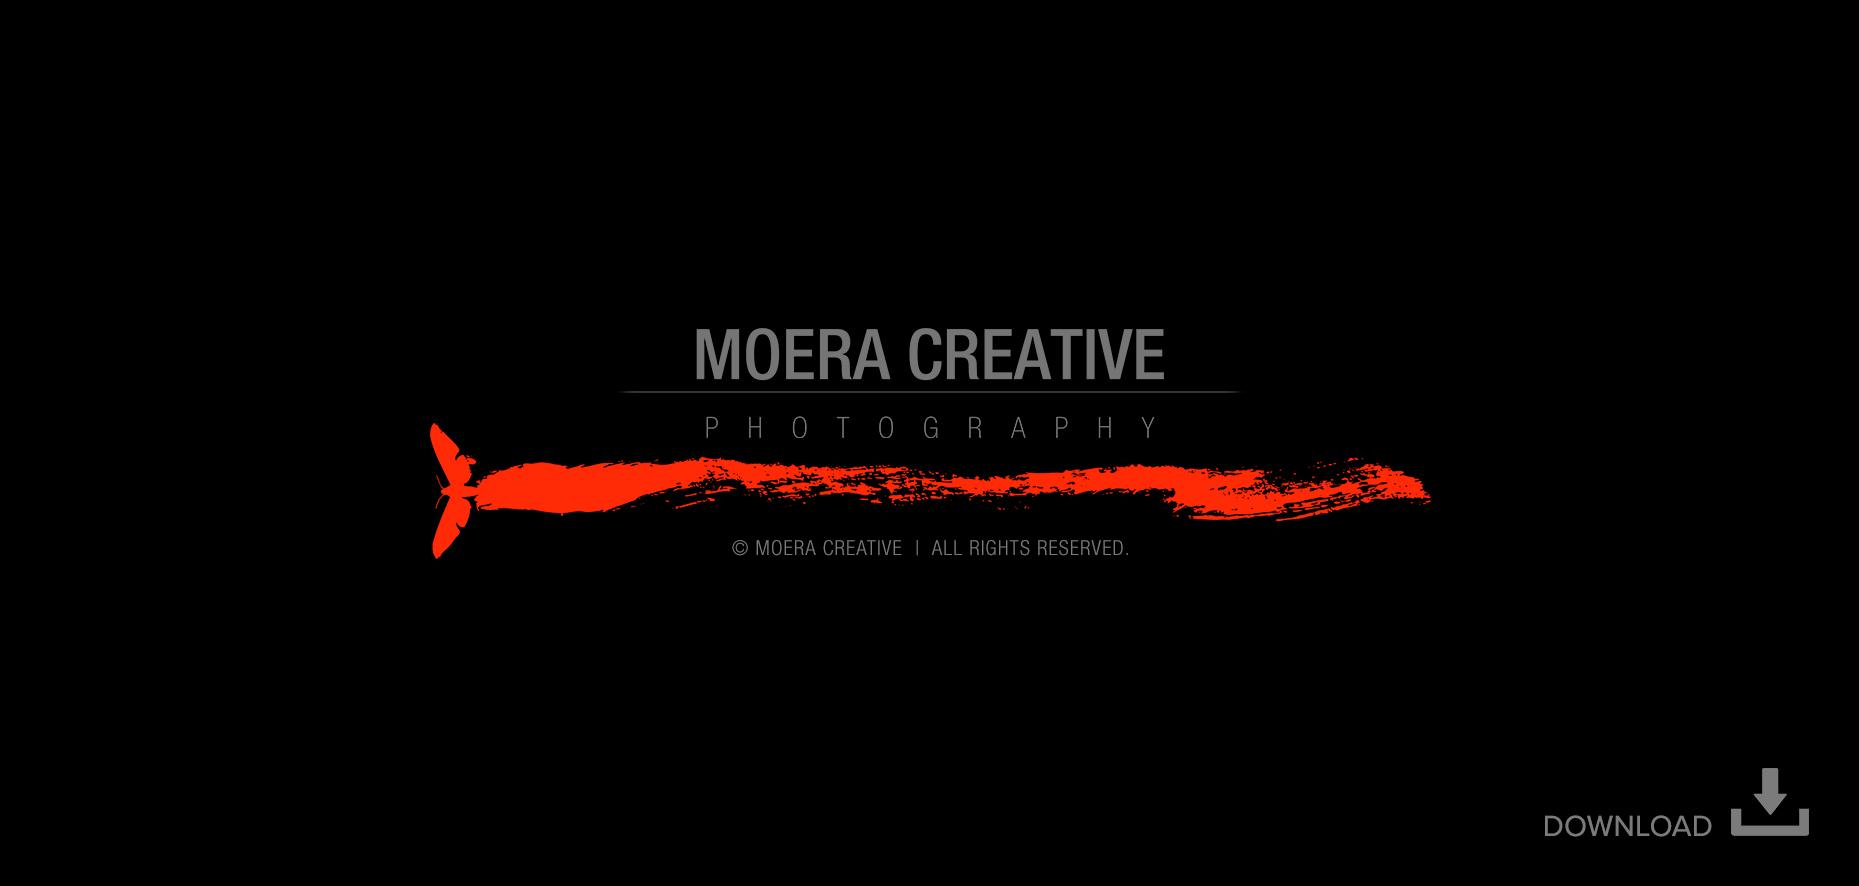 More Creative Photography Portfolio